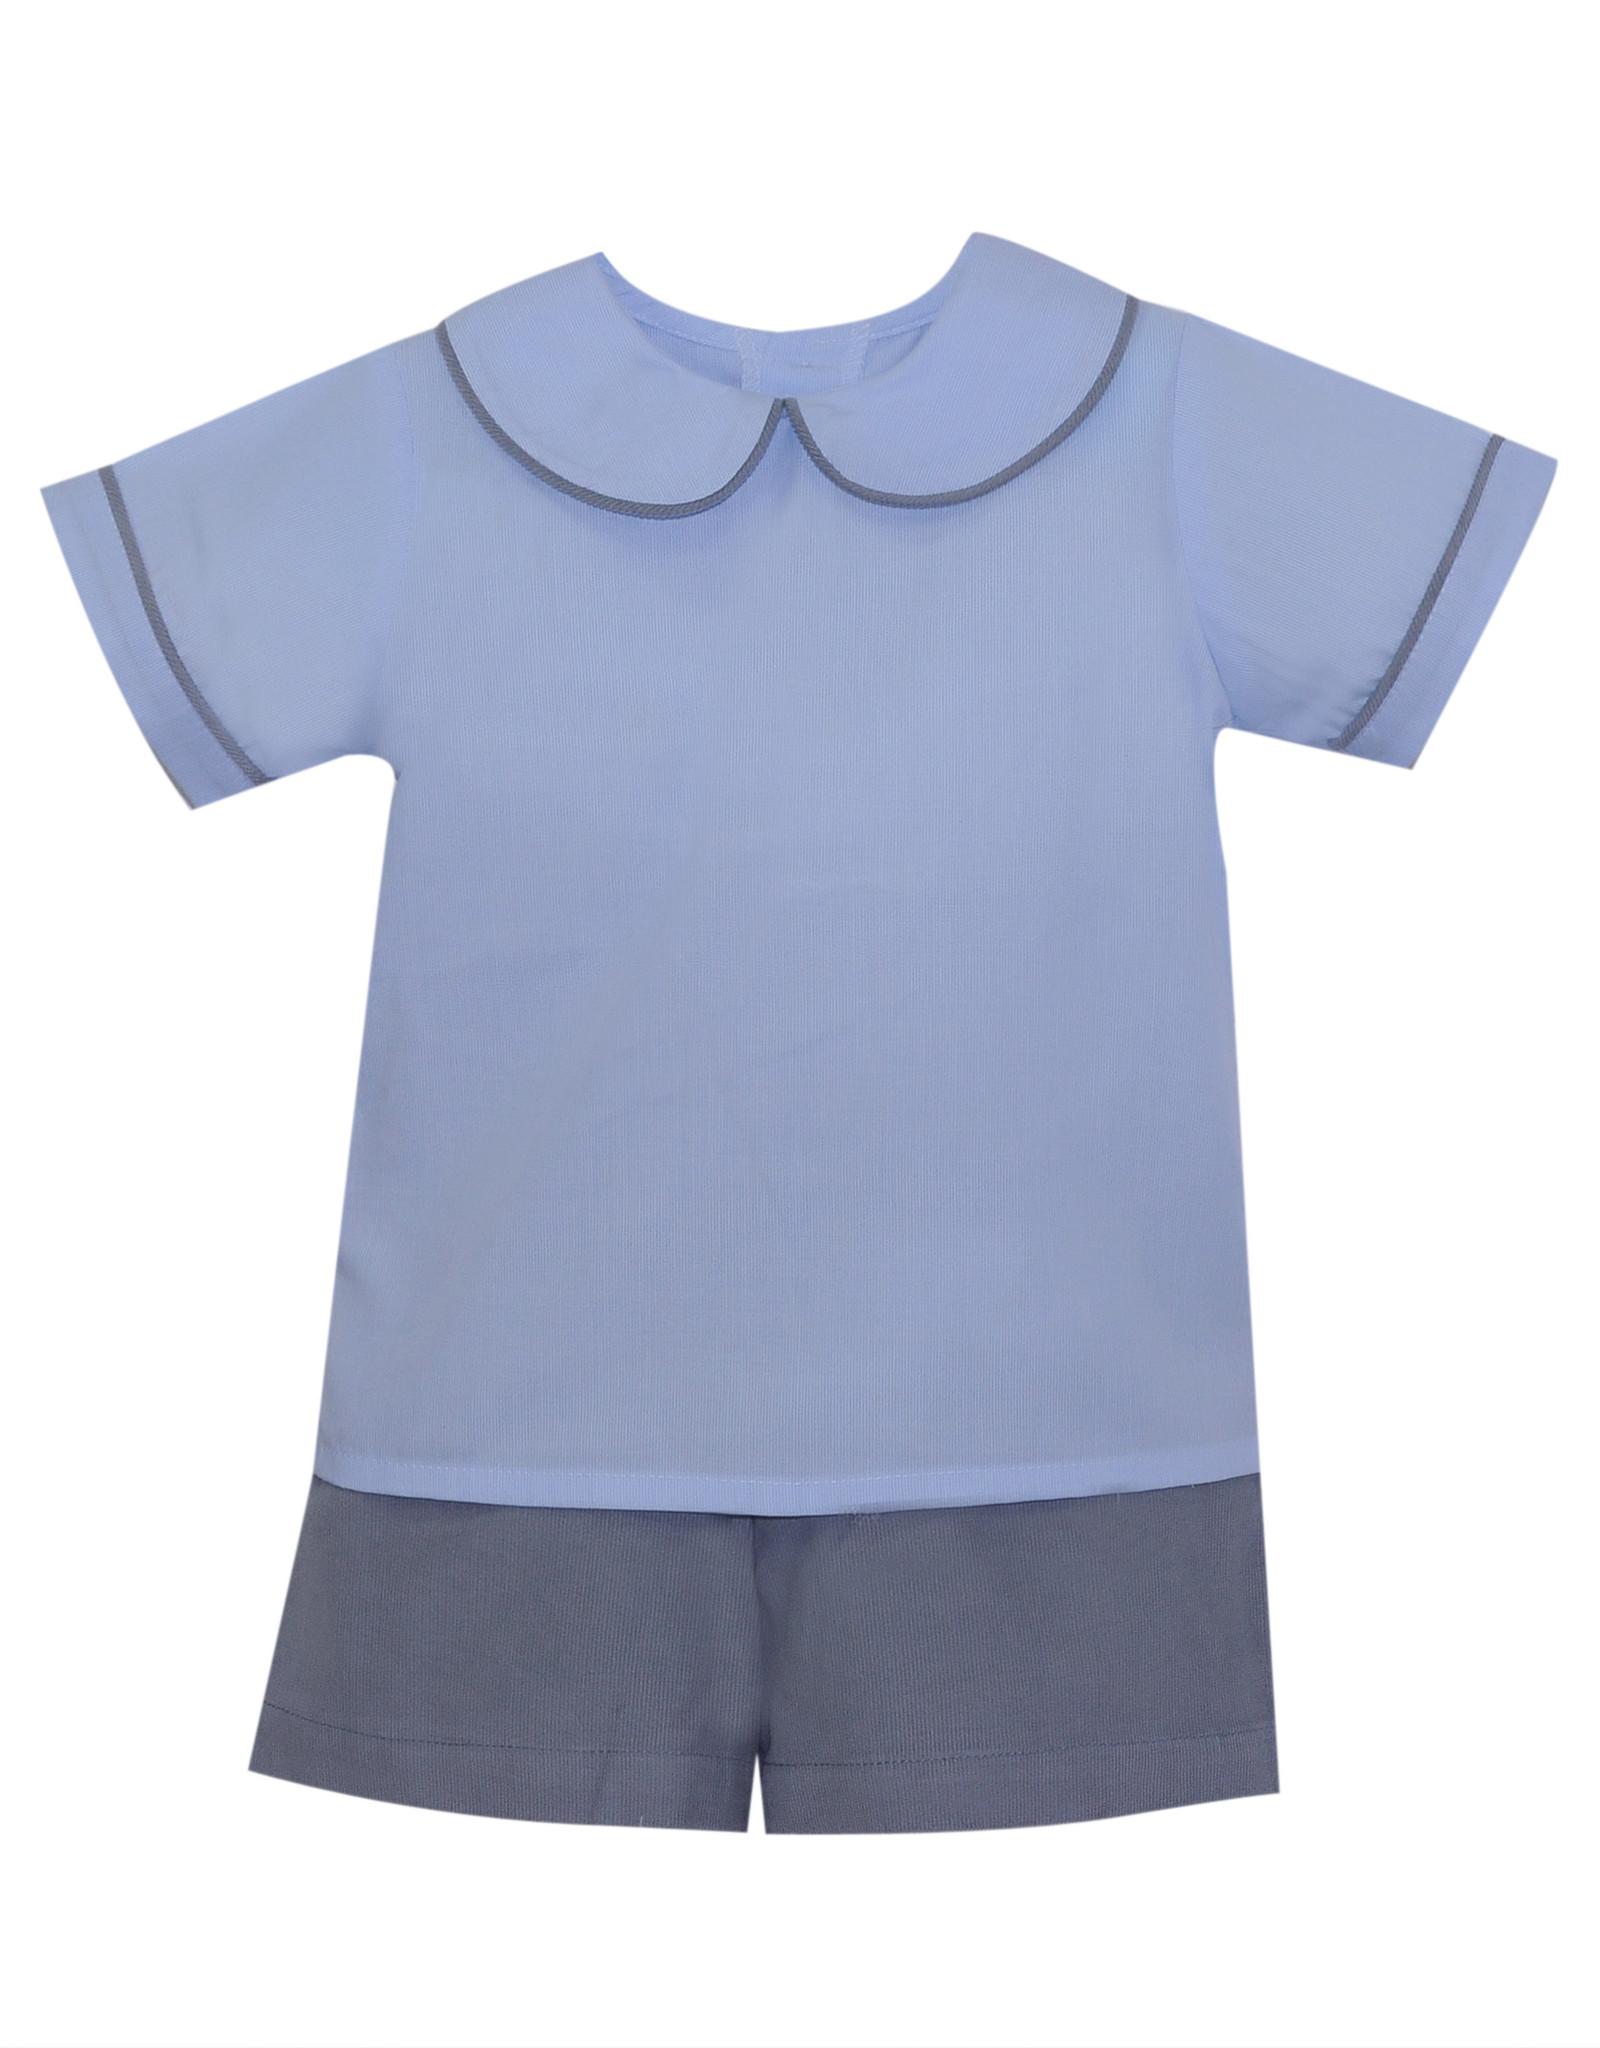 LullabySet Blue And Grey Sibley Short Set